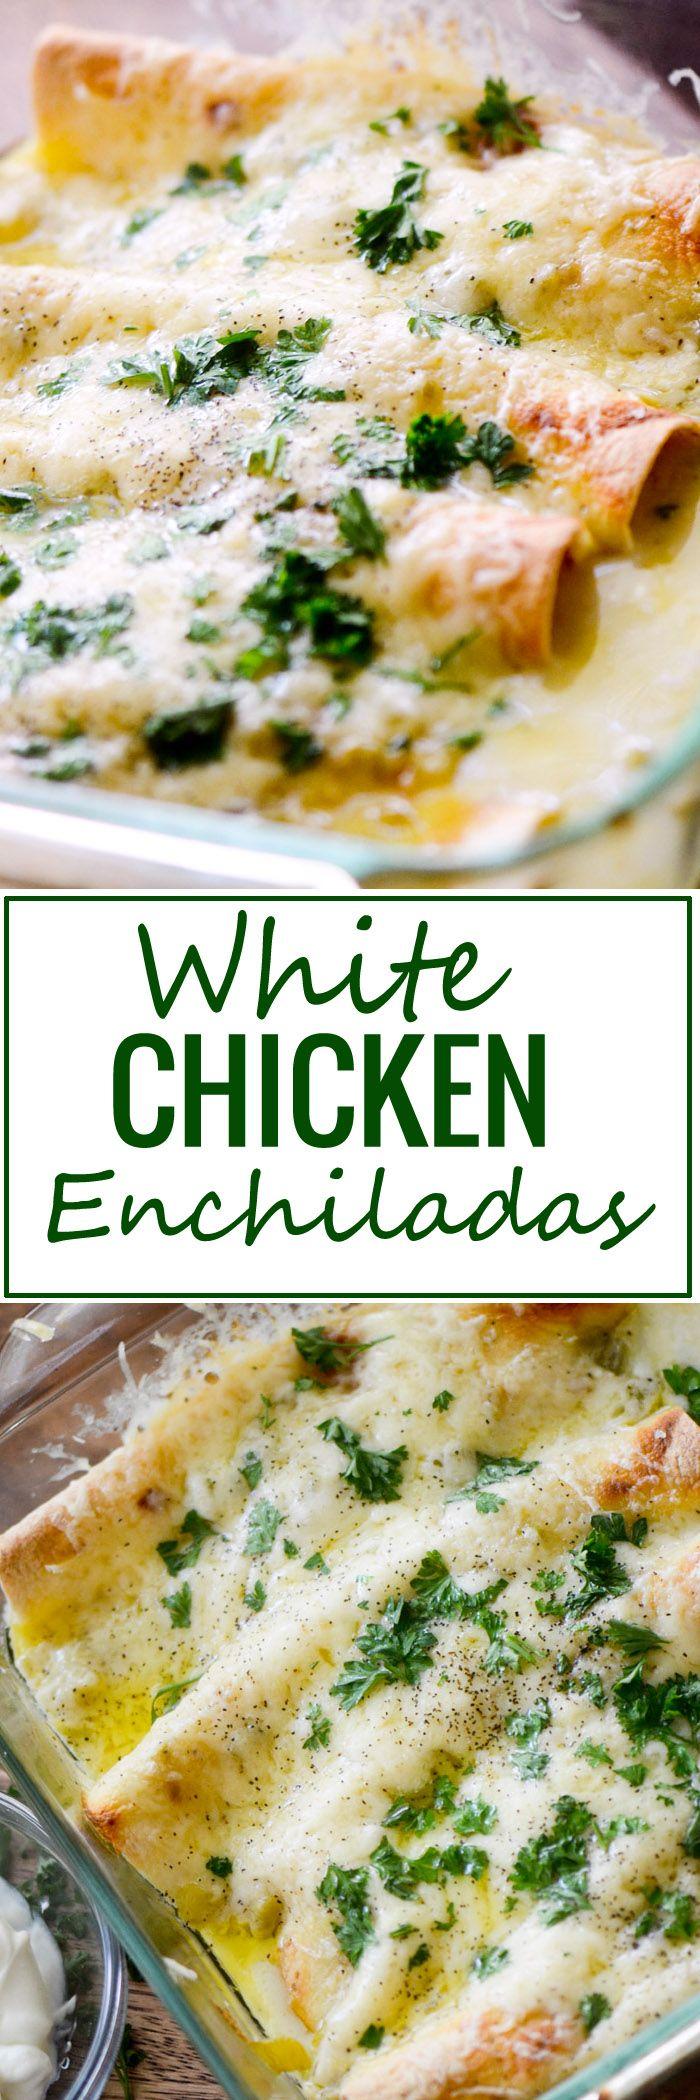 White Chicken Enchiladas - Recipe Diaries